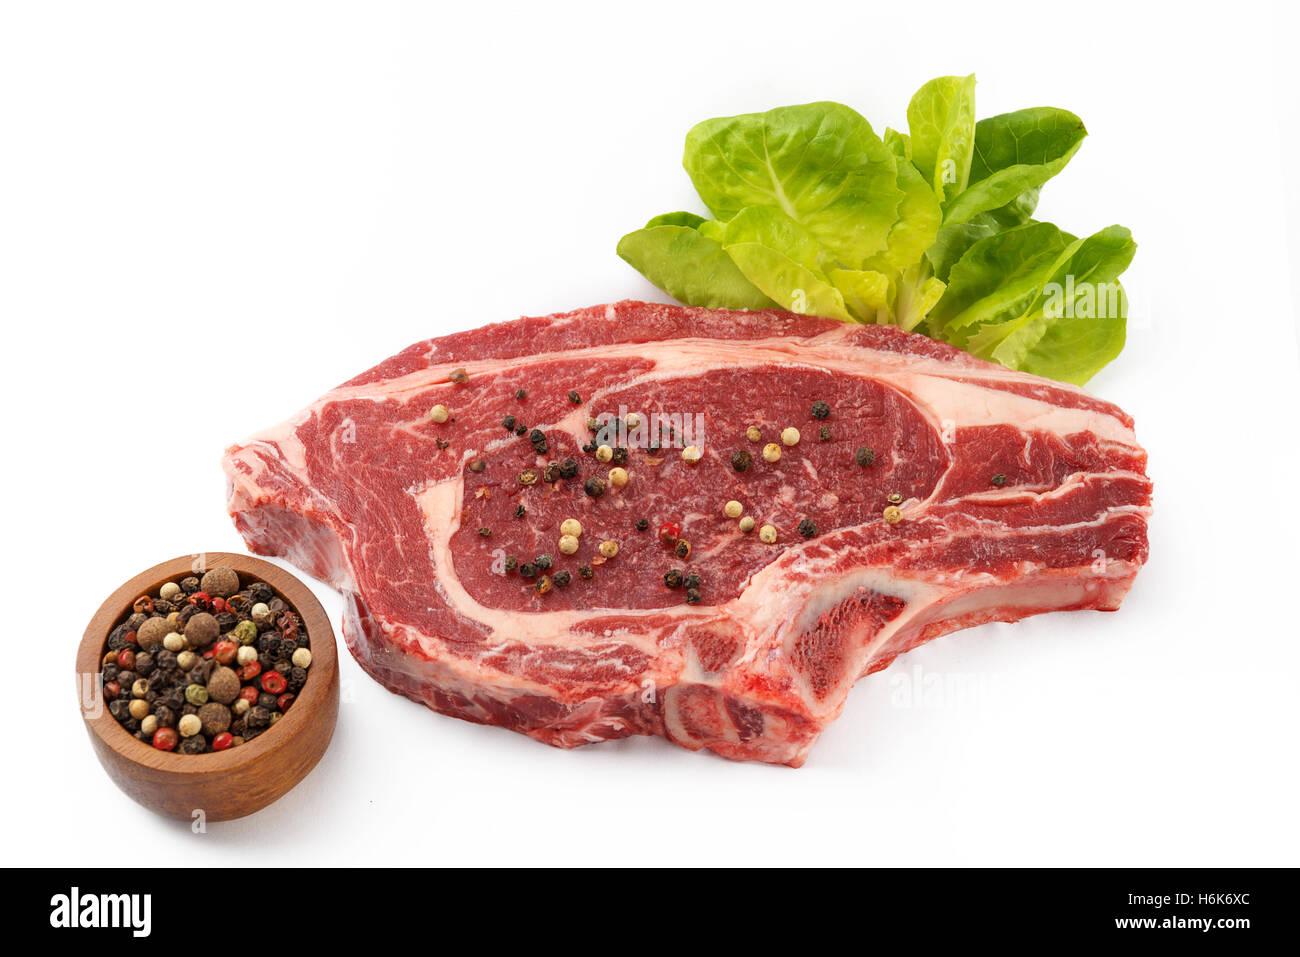 Jugosas materias steak sobre un fondo blanco aislado Imagen De Stock